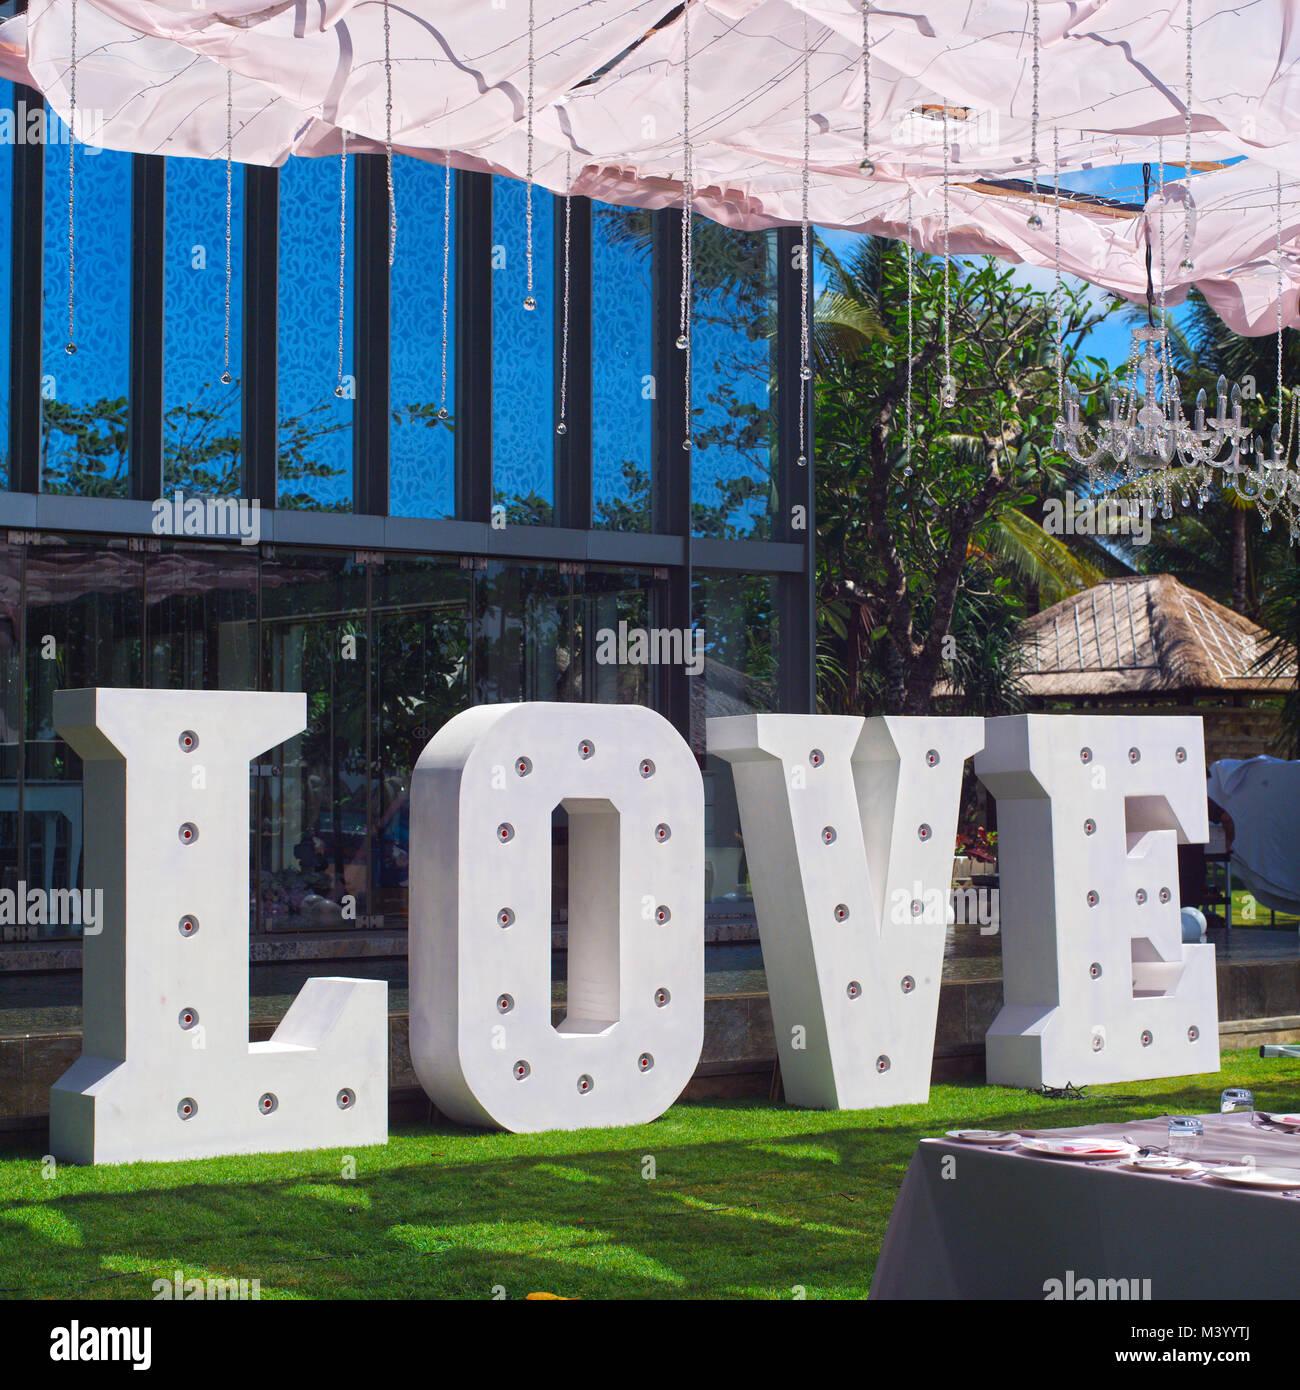 wedding decor big love letters decoration on festive table luxurious wedding decoration on restaurant table elegant event